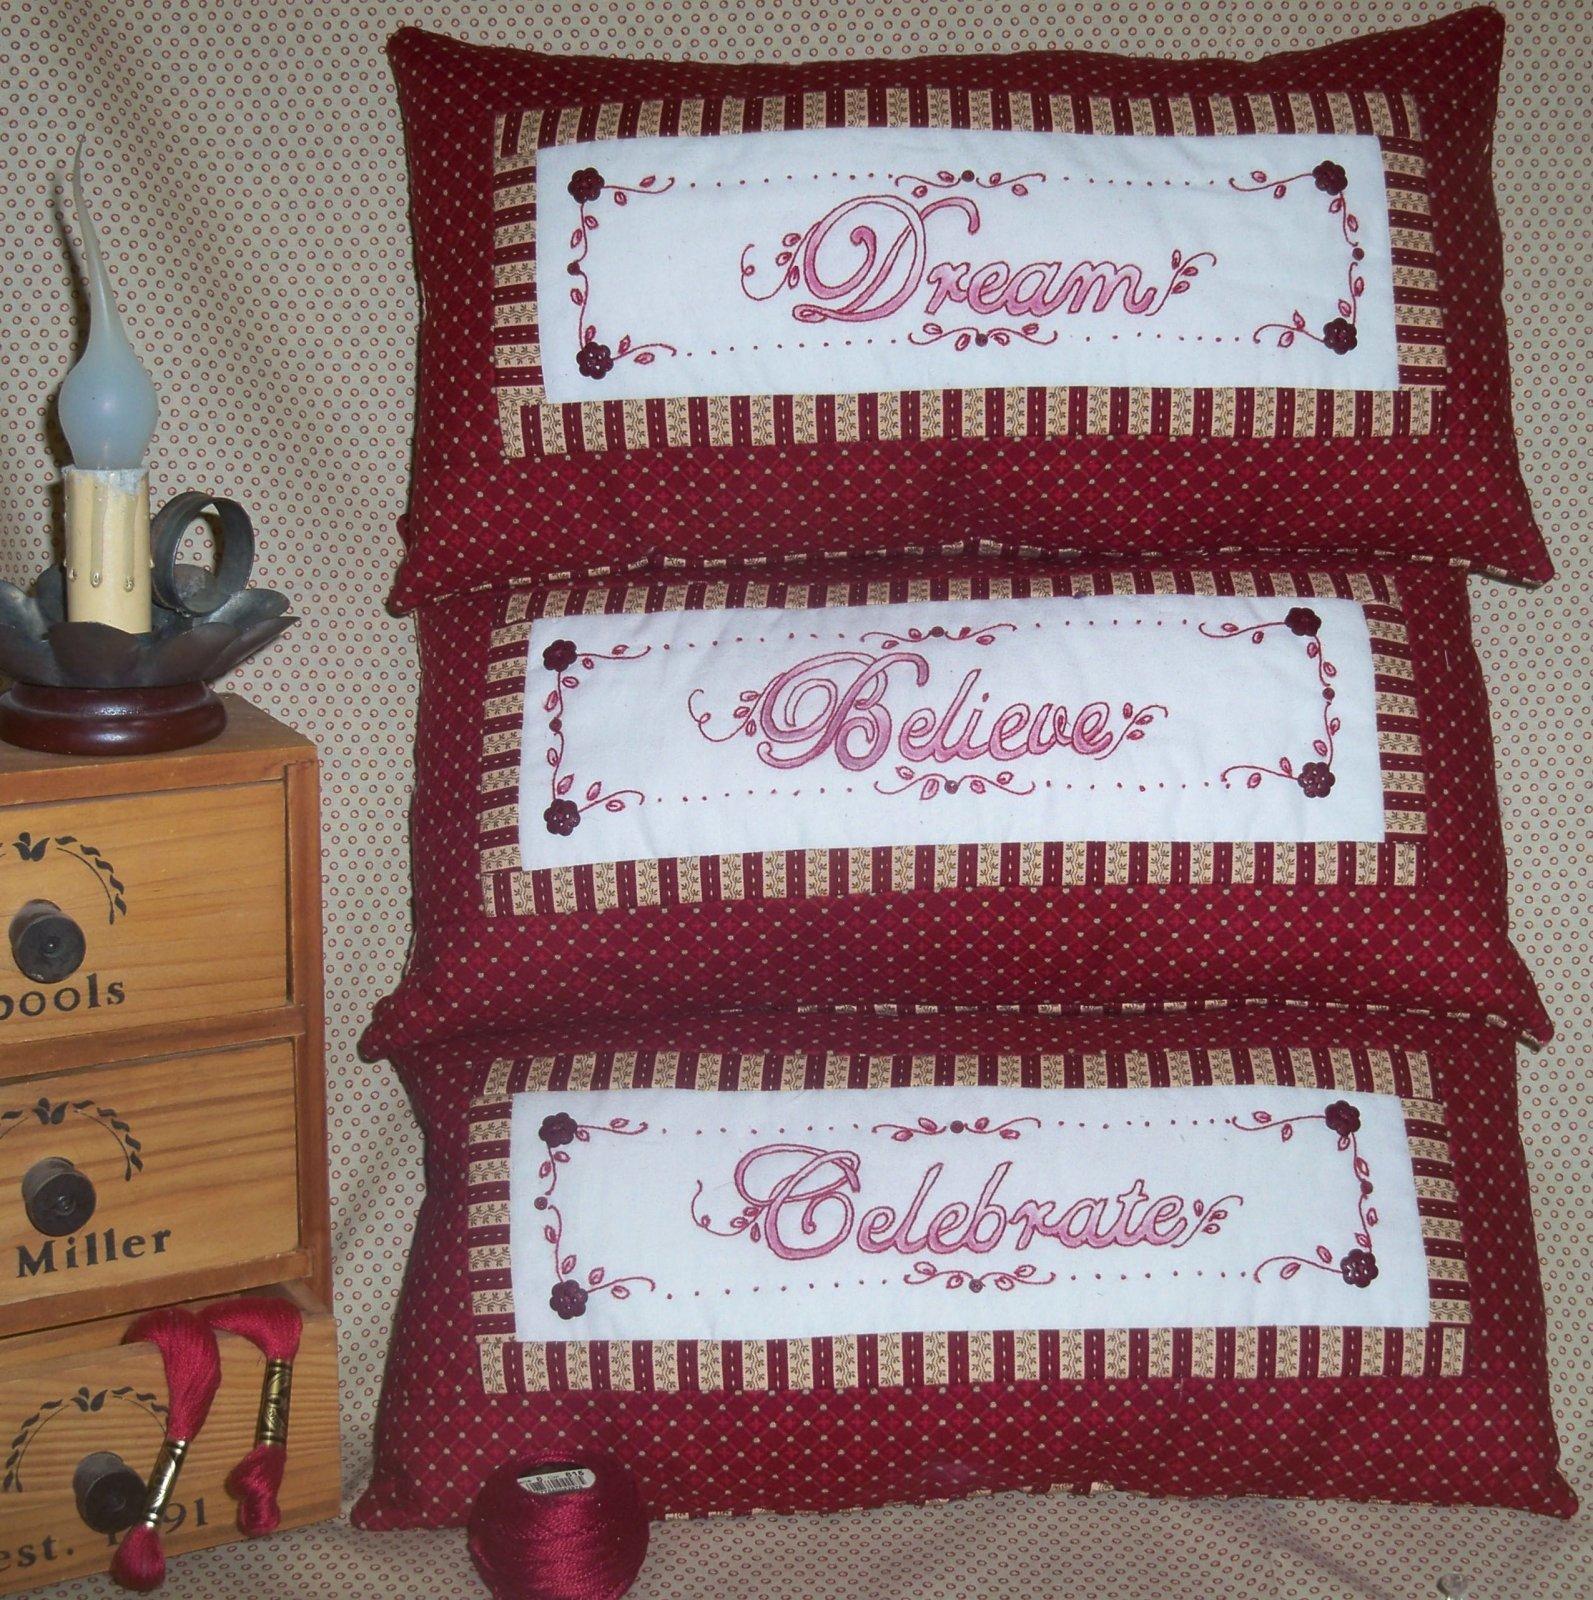 714R Redwork Dream Celebrate Believe Shelf Pillows